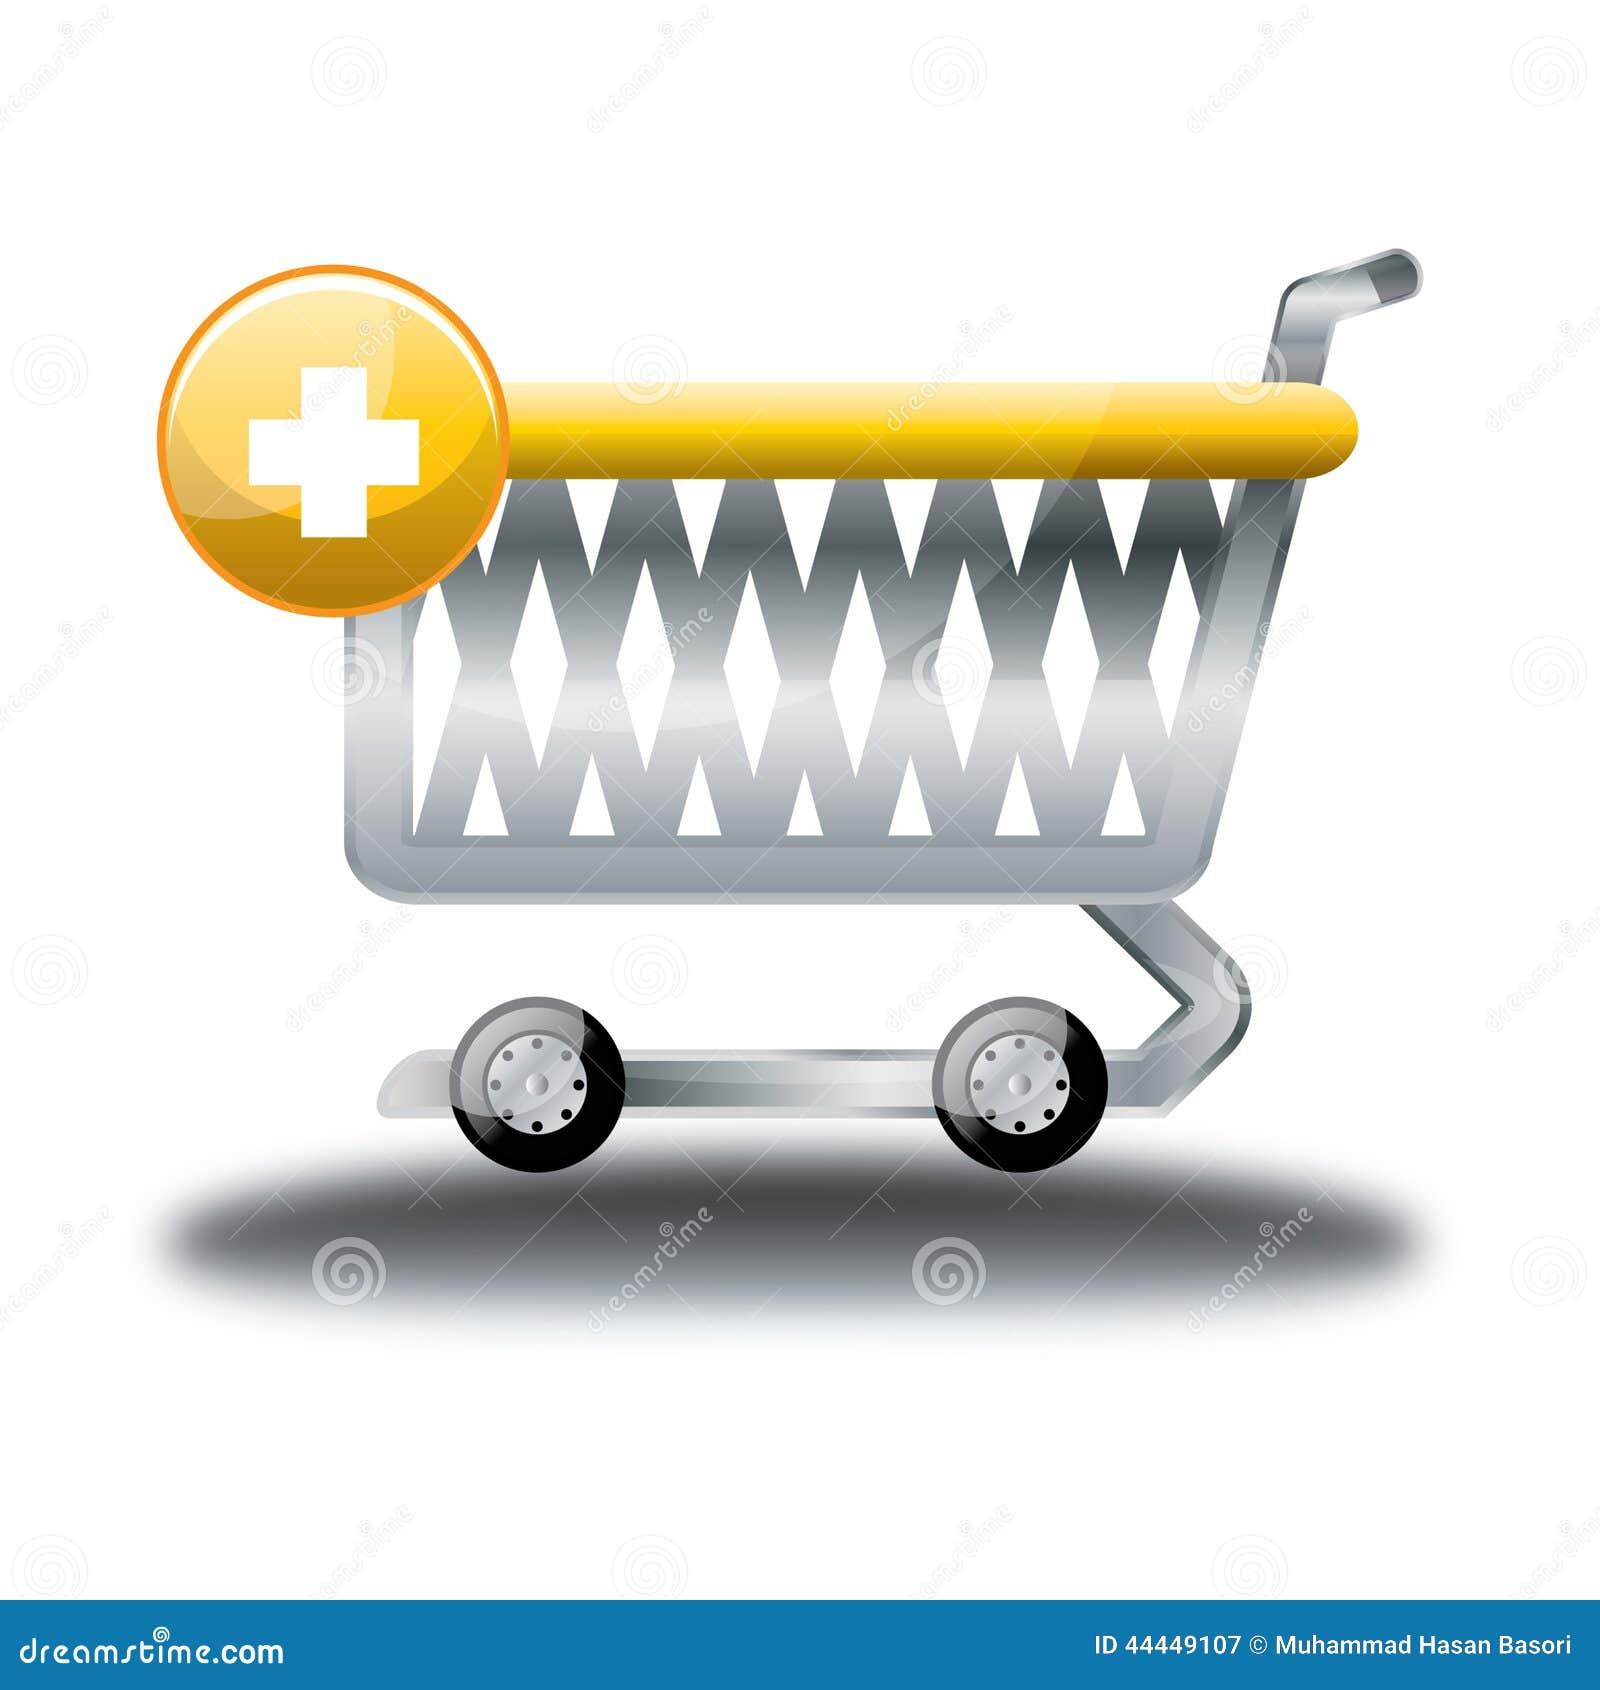 trolli buy online shop cartoon icon stock vector image 44449107. Black Bedroom Furniture Sets. Home Design Ideas